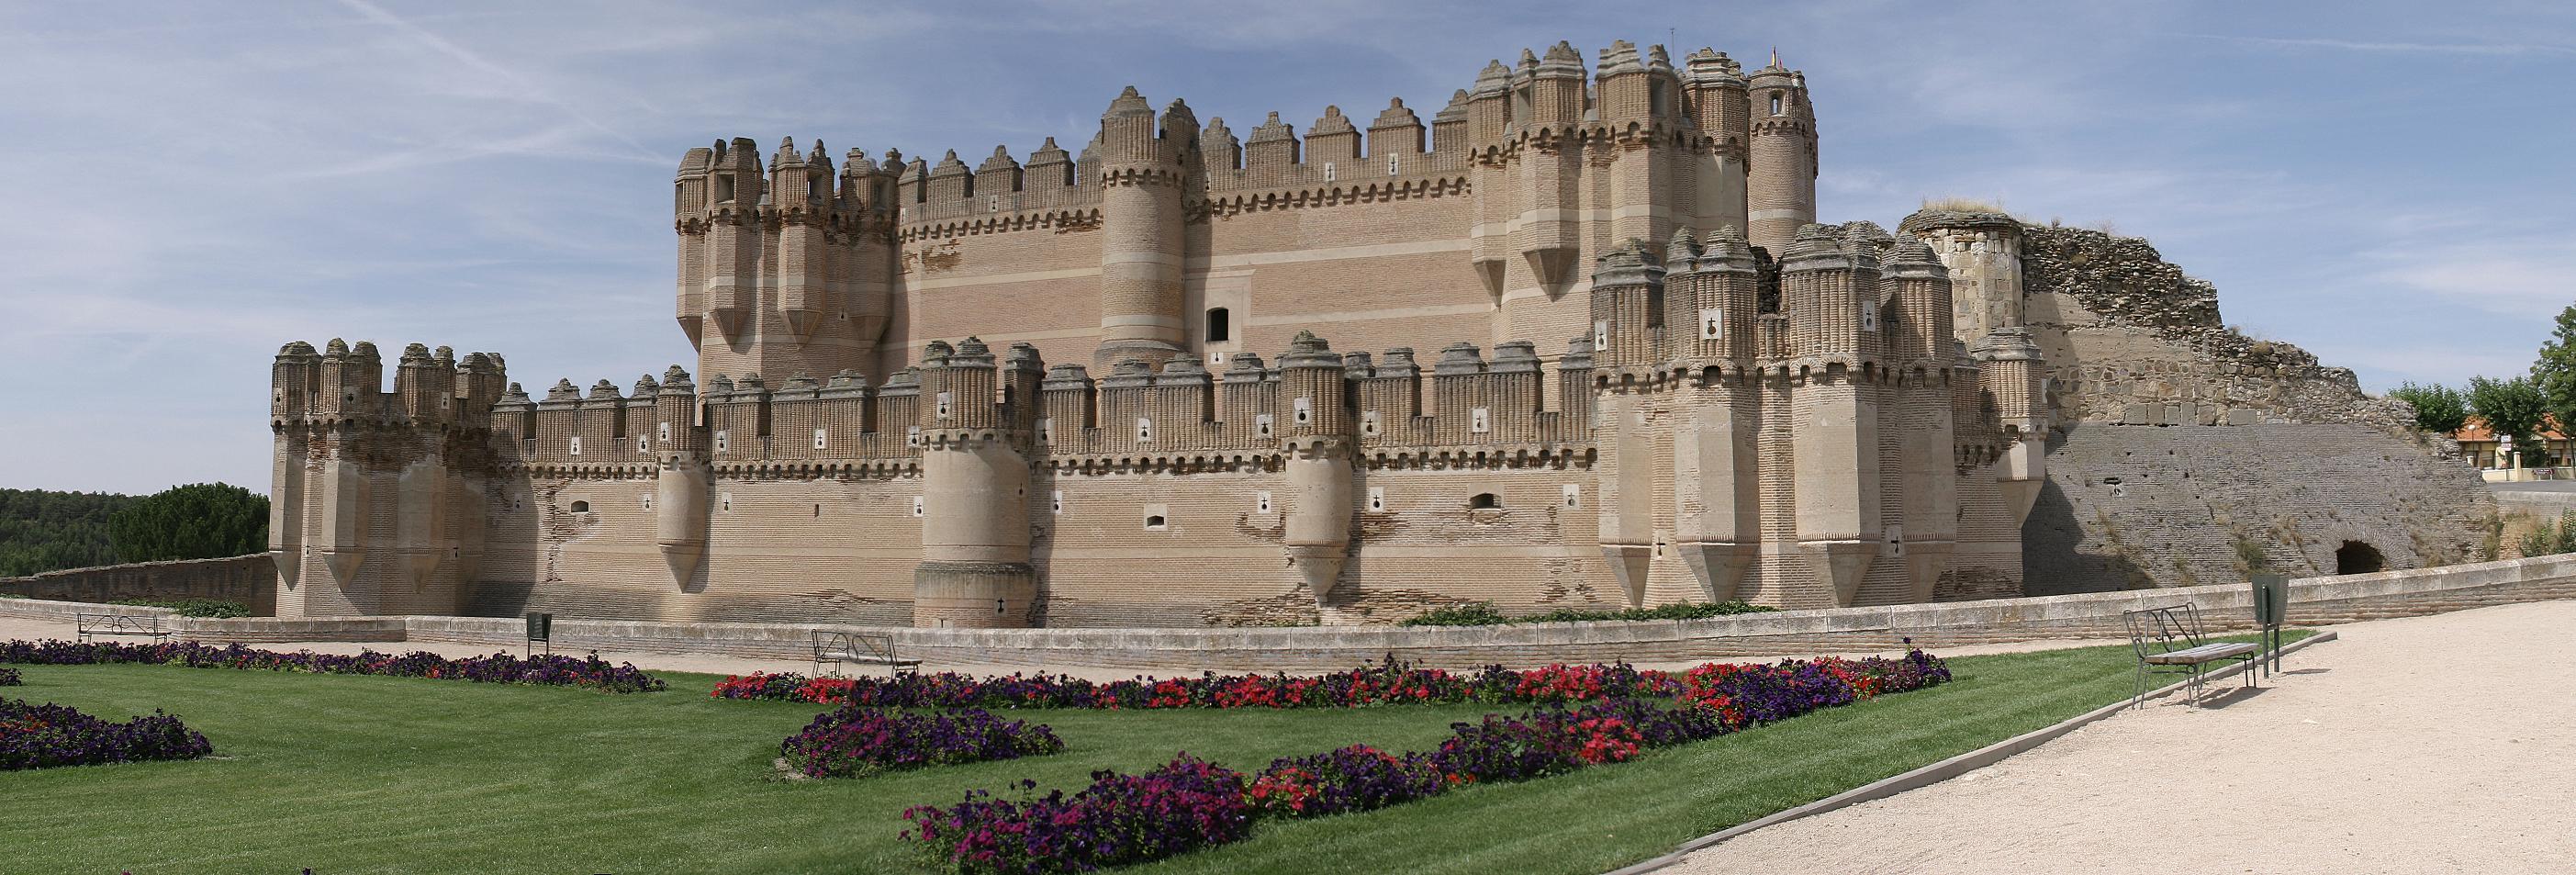 Coca Castle, Segovia, Most Beautiful Castles in Spain